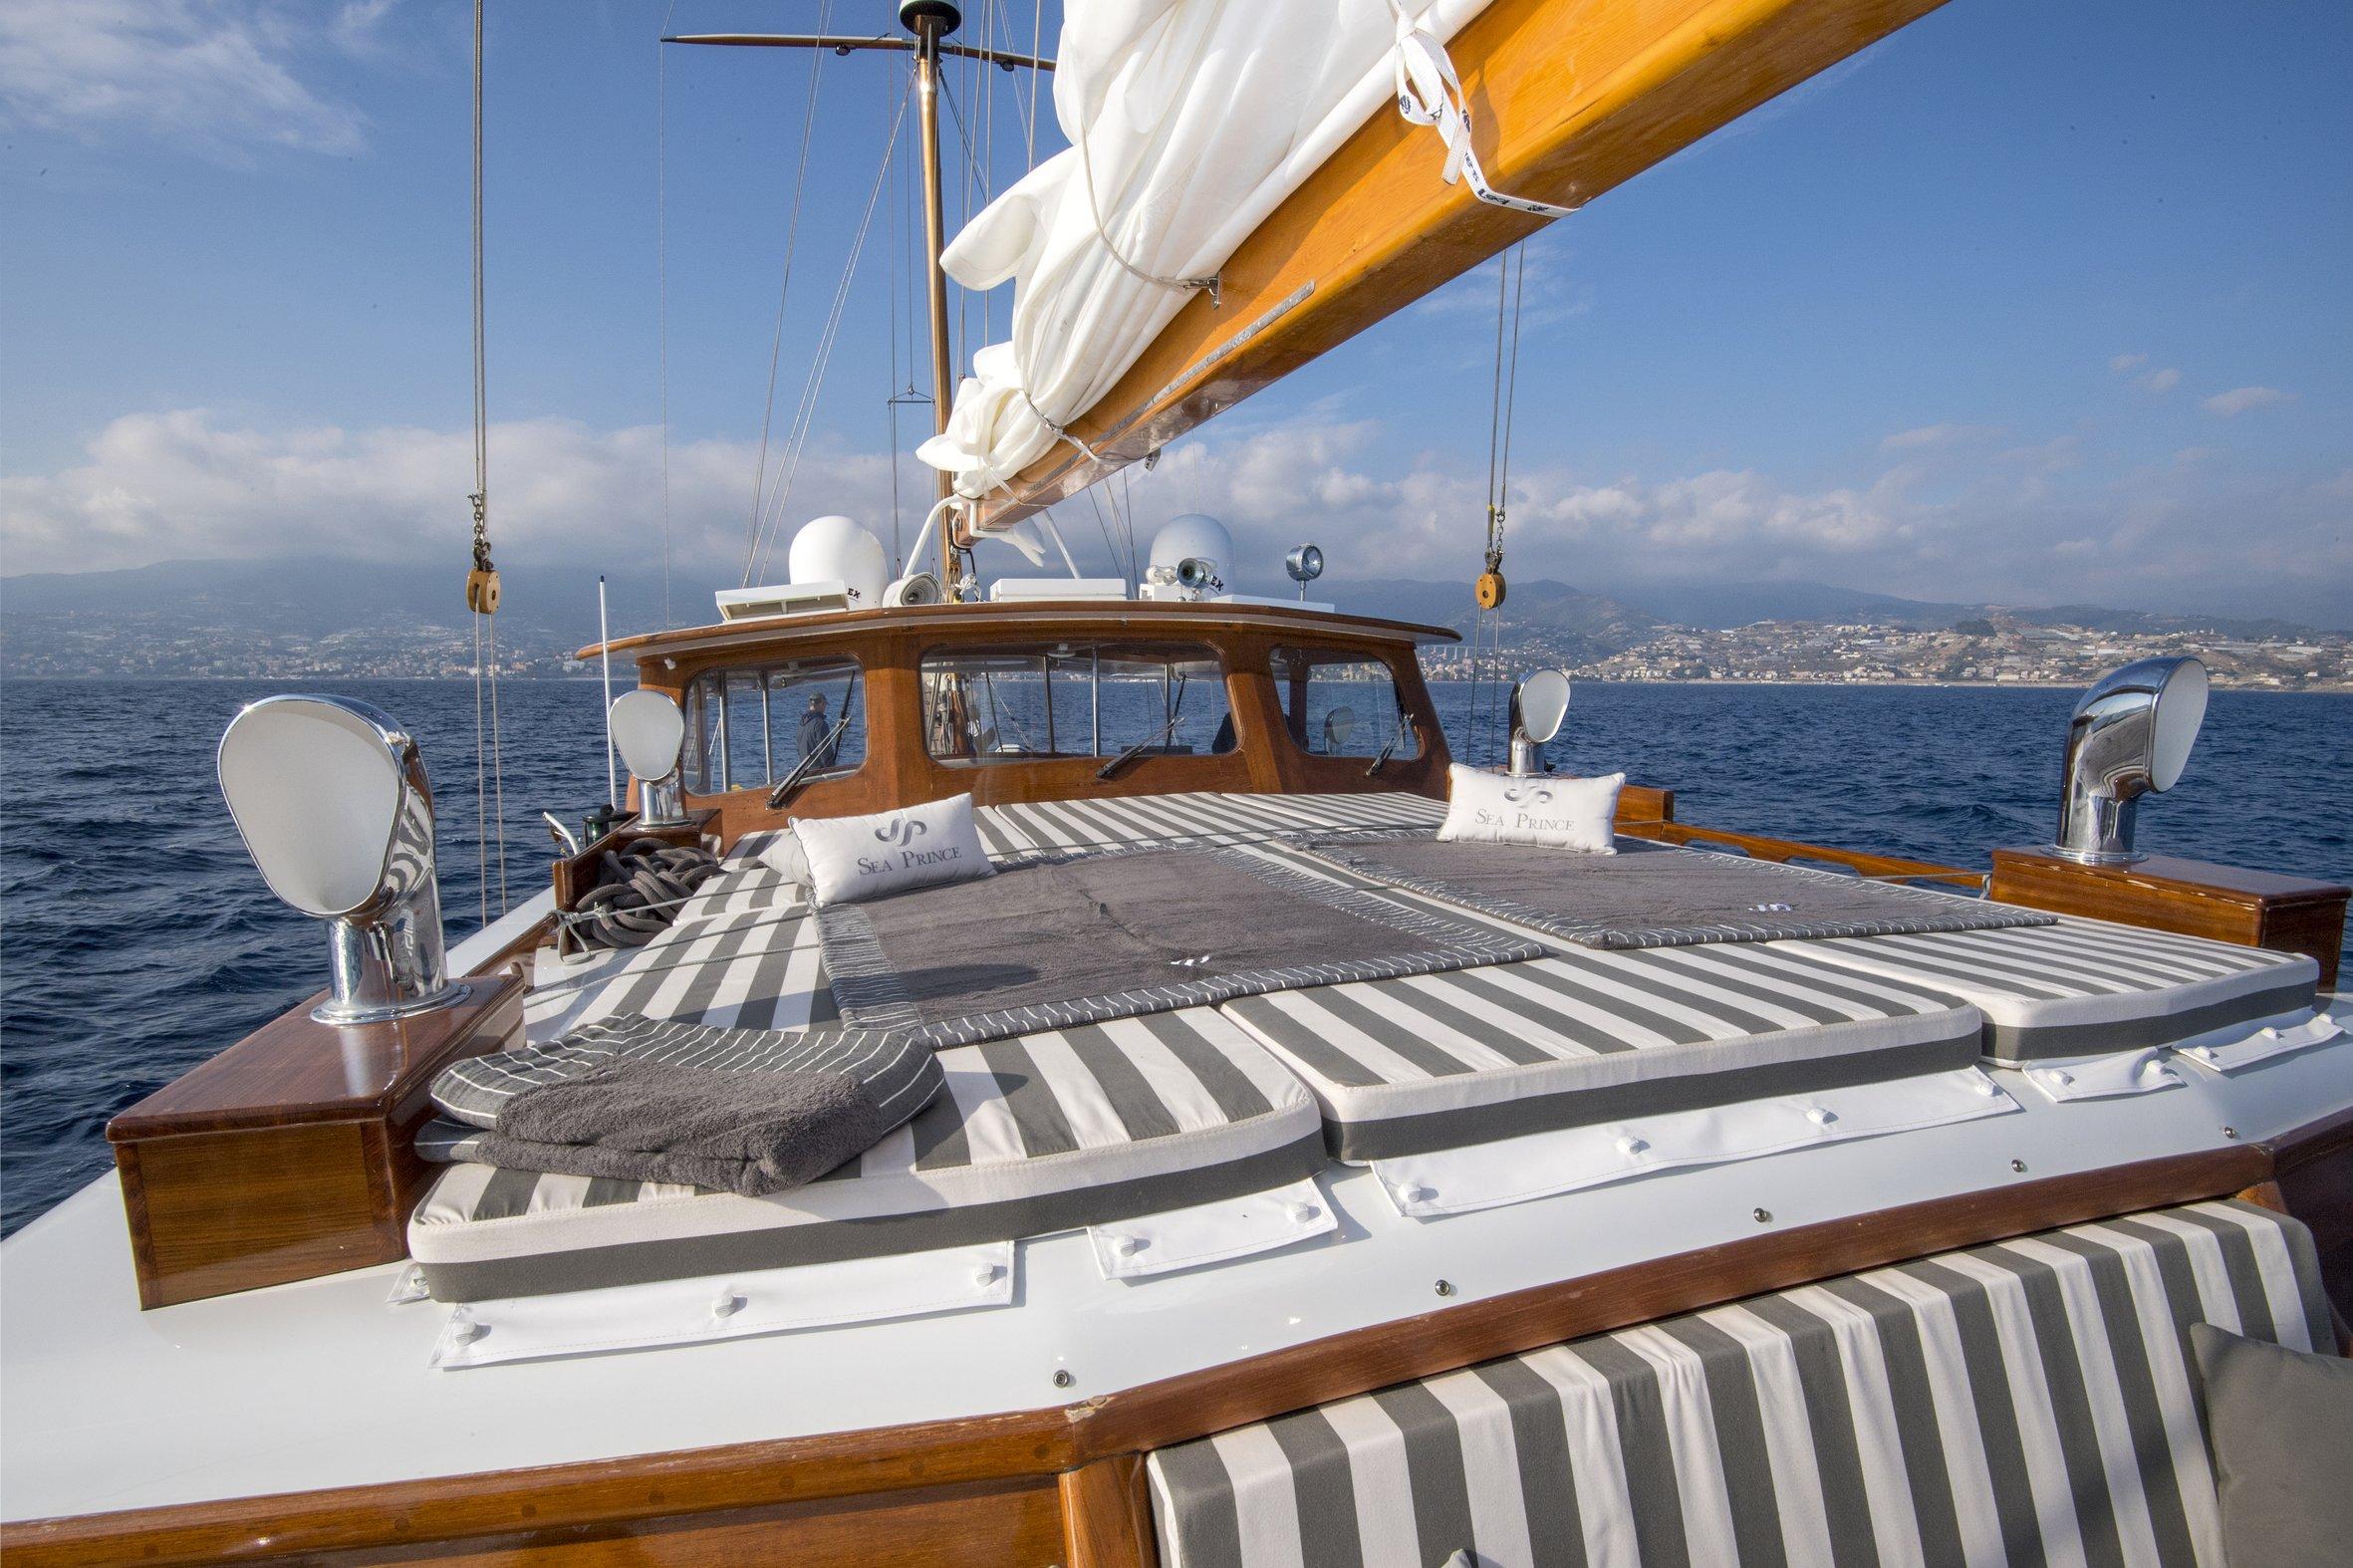 seaprince_deck459_phBluePassion.jpg